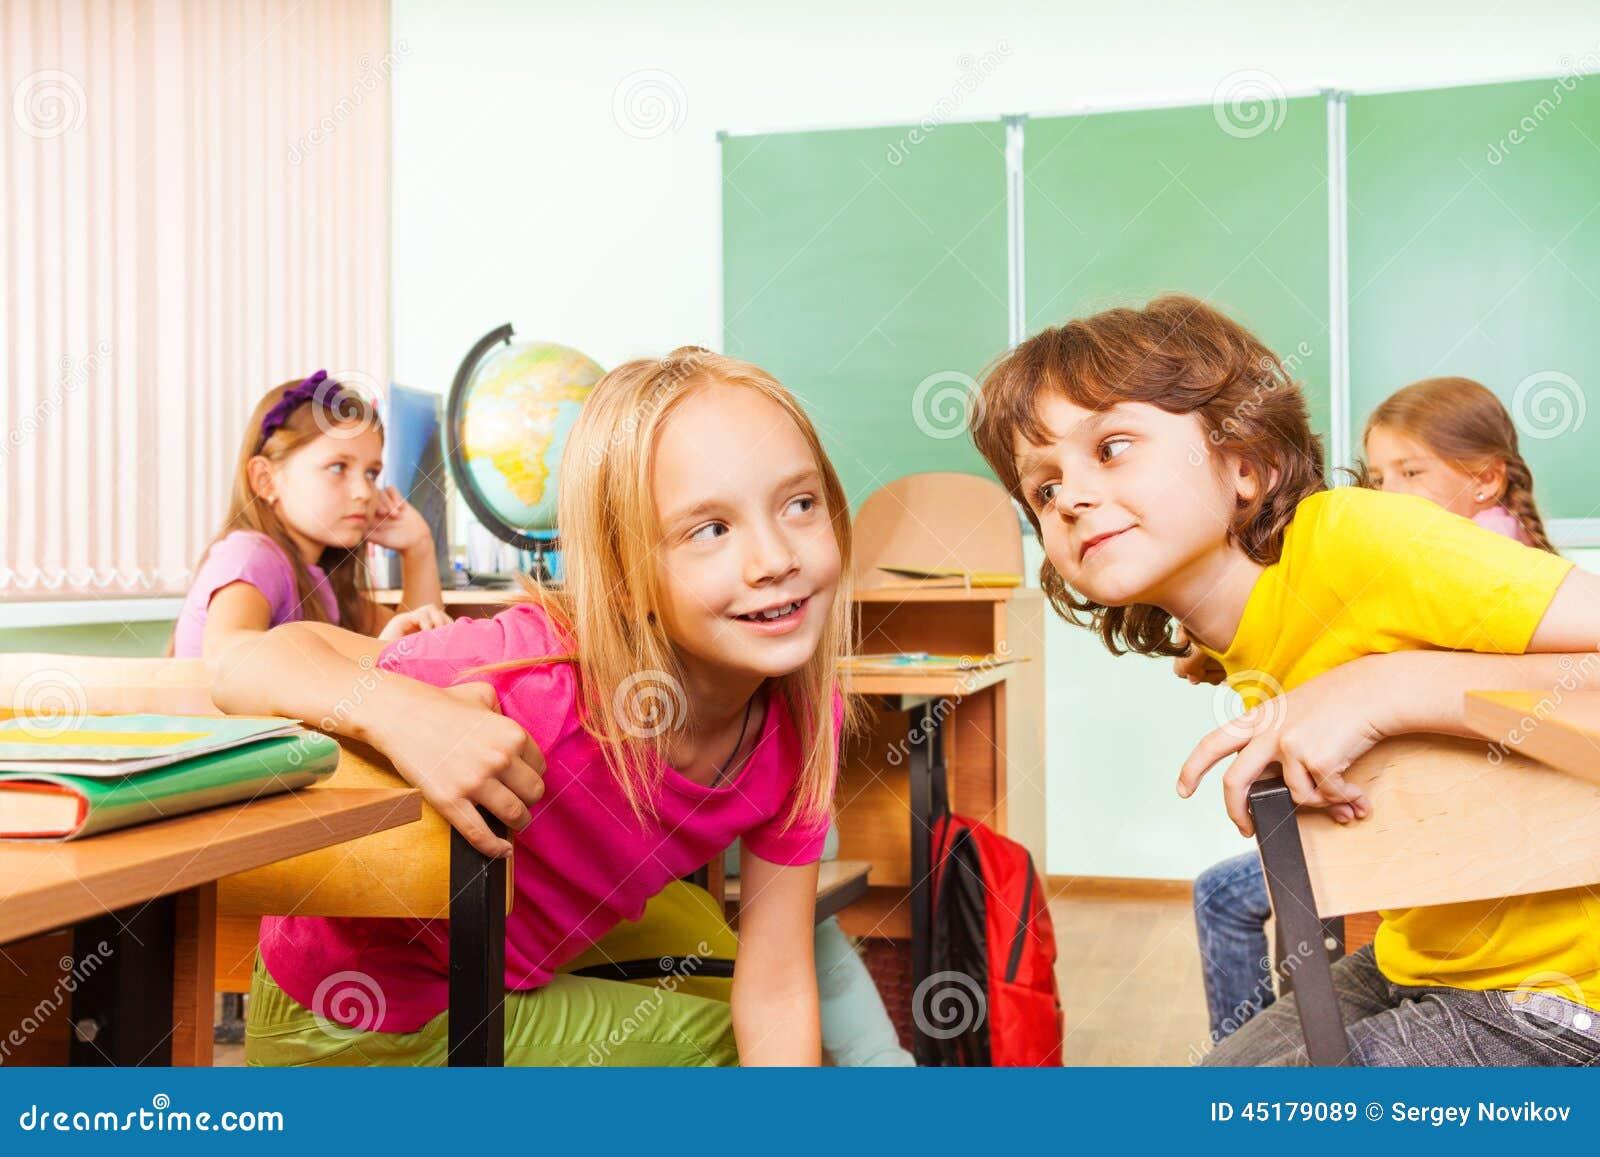 секс во время урока училка показала розовые трусики фото и видео